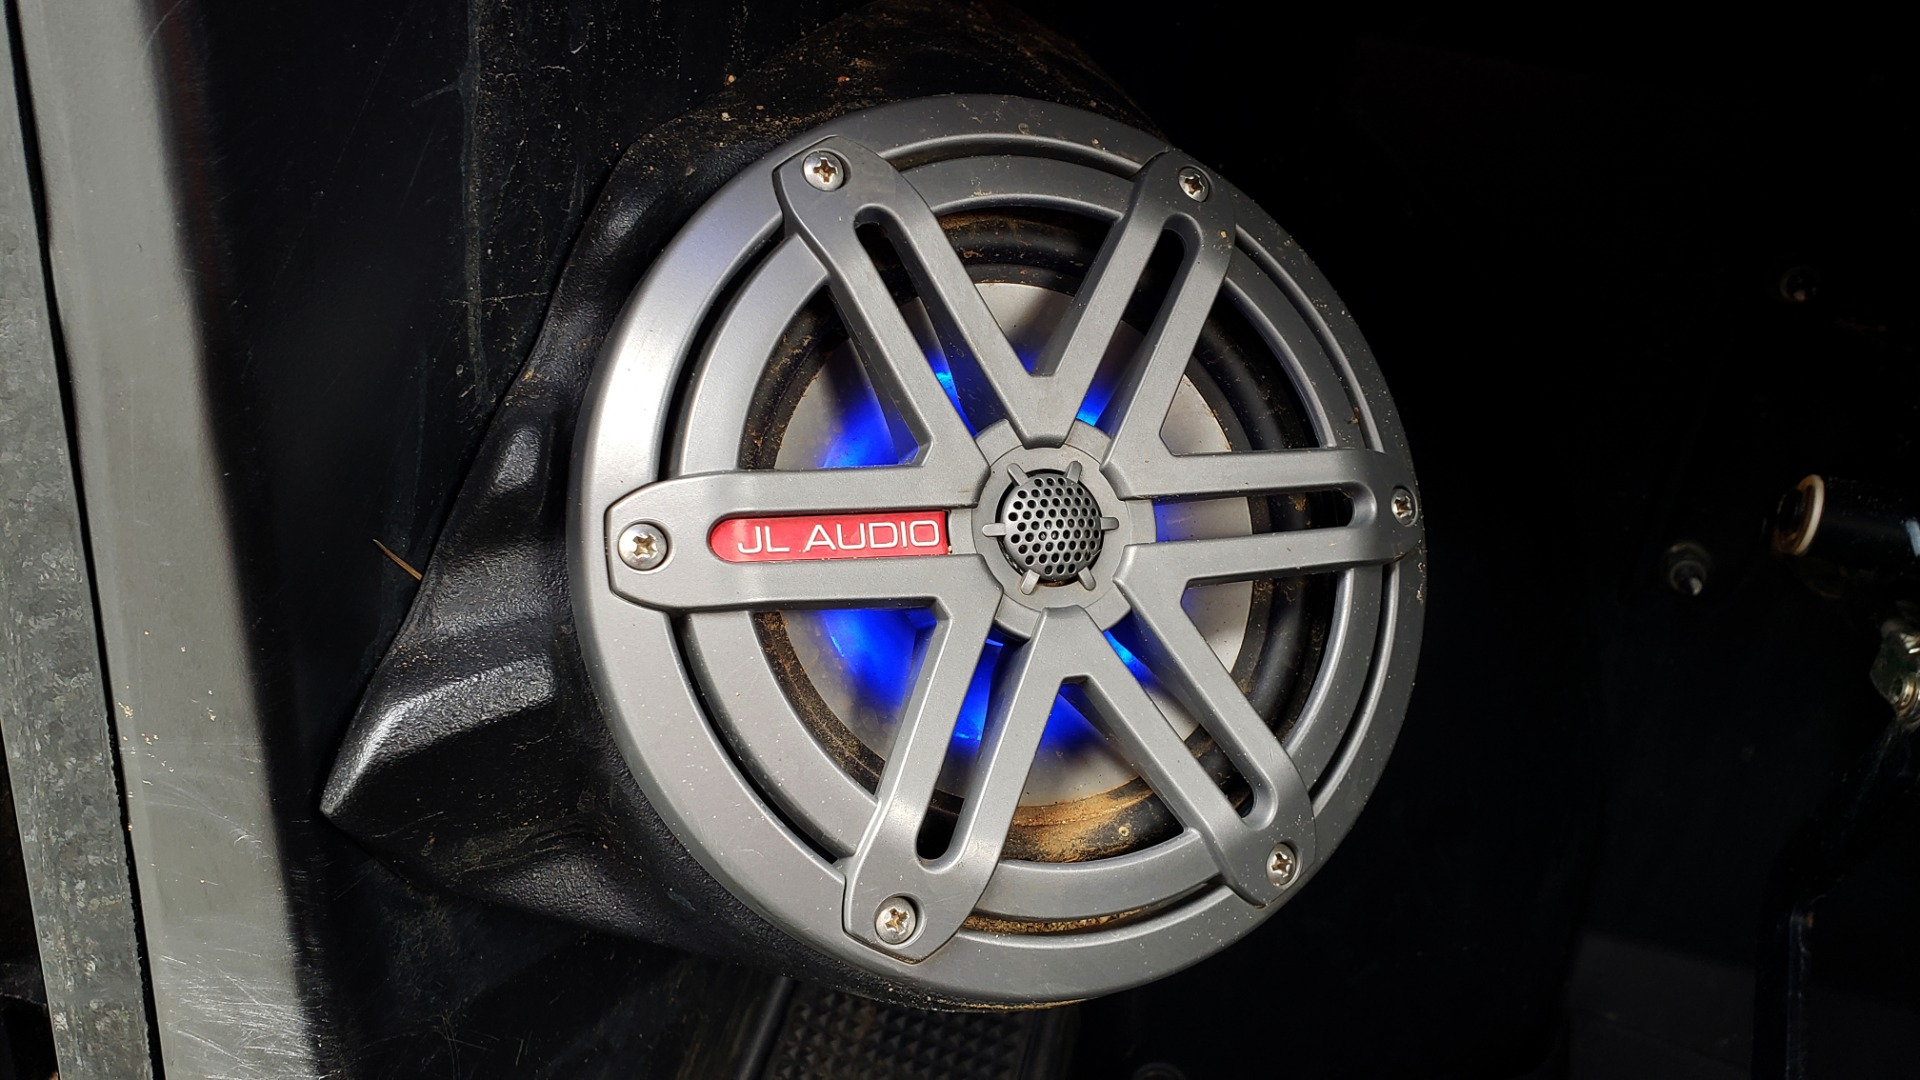 Used 2018 Polaris GENERAL 4 1000 EPS / 4-SEATER / TILT BED / LED LIGHT BARS / BACK-UP CAMERA for sale Sold at Formula Imports in Charlotte NC 28227 21